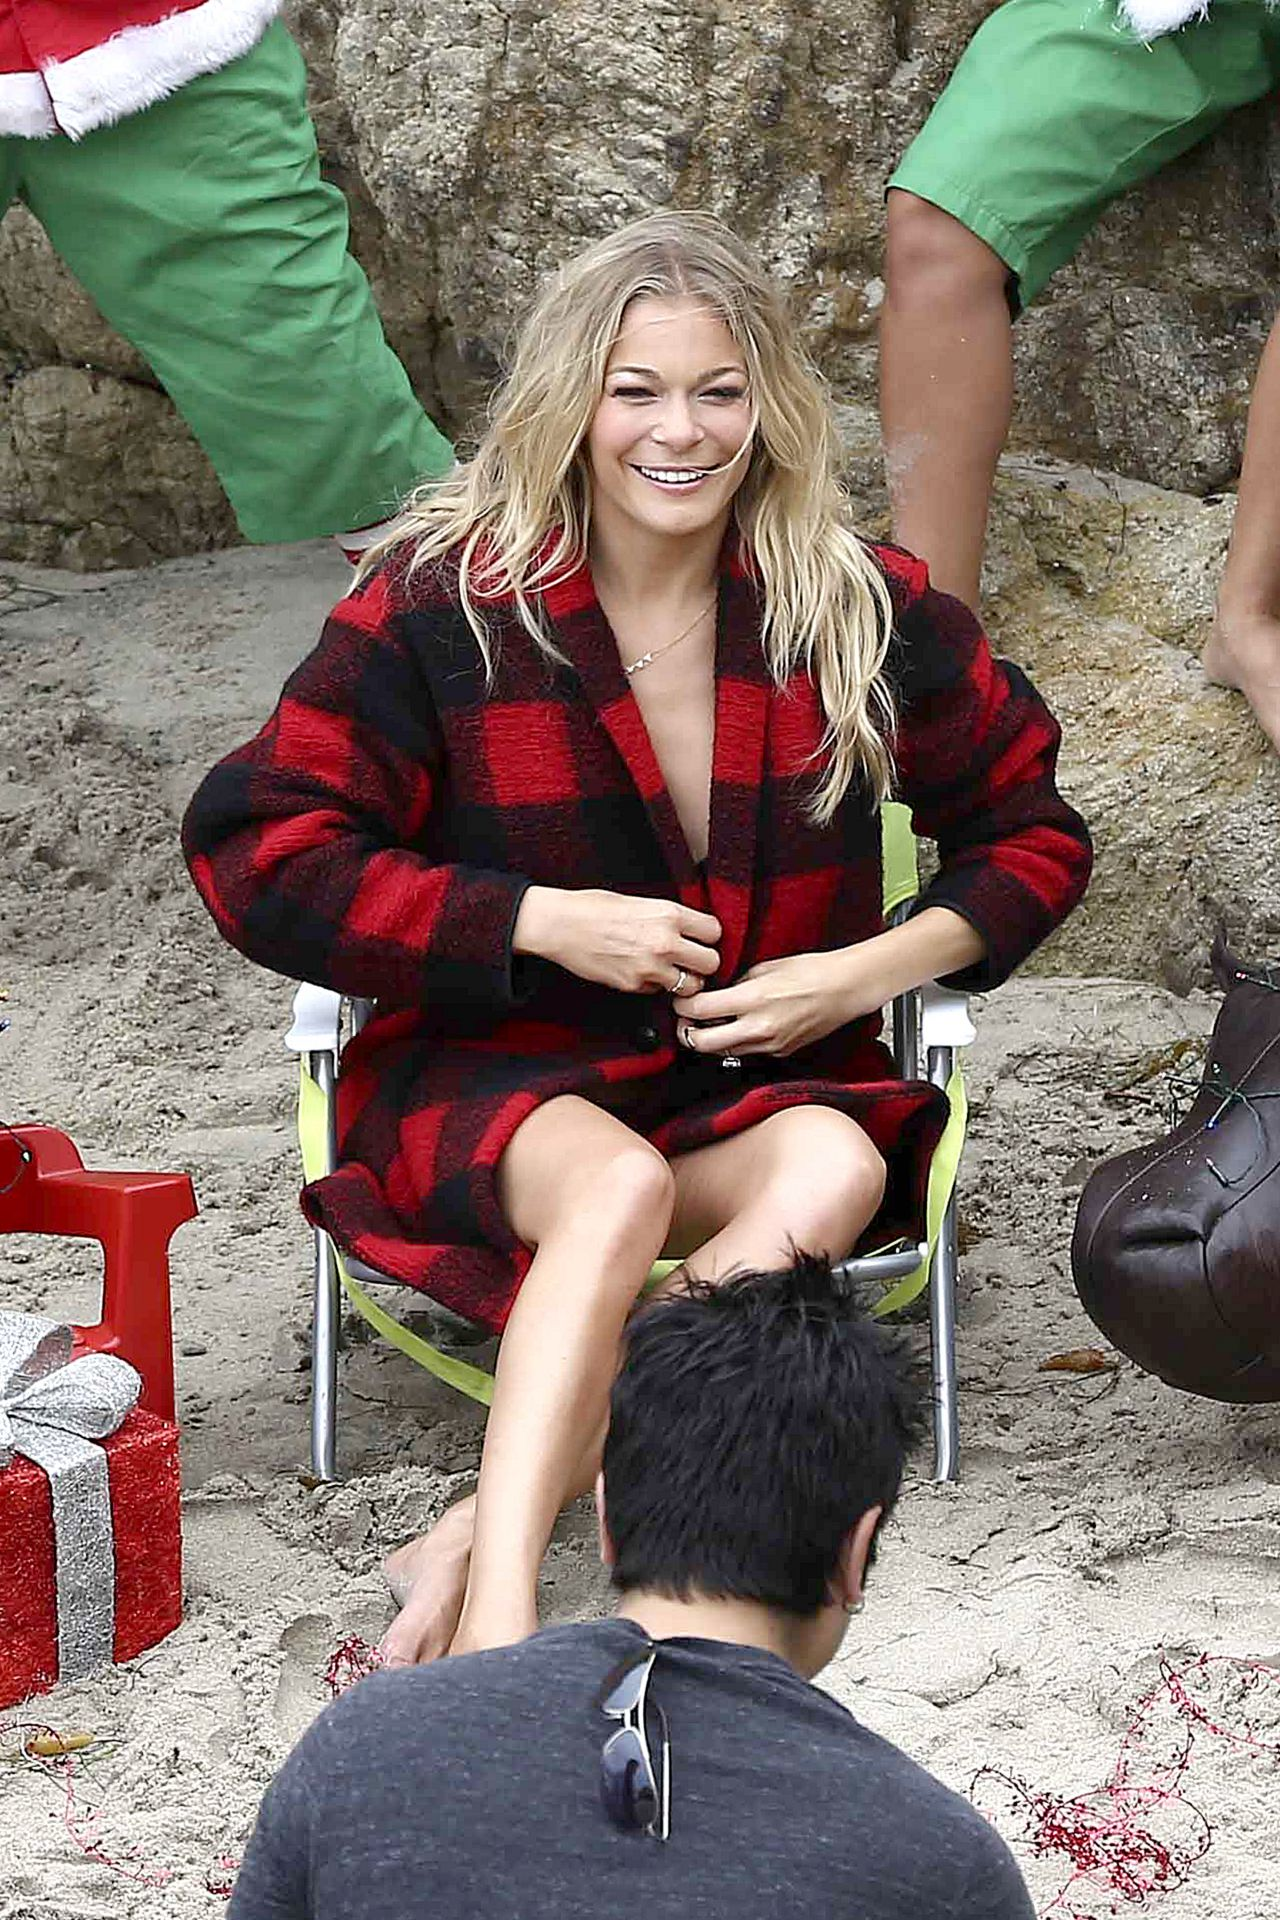 Leann Rimes Bikini Photoshoot In Malibu July 2014